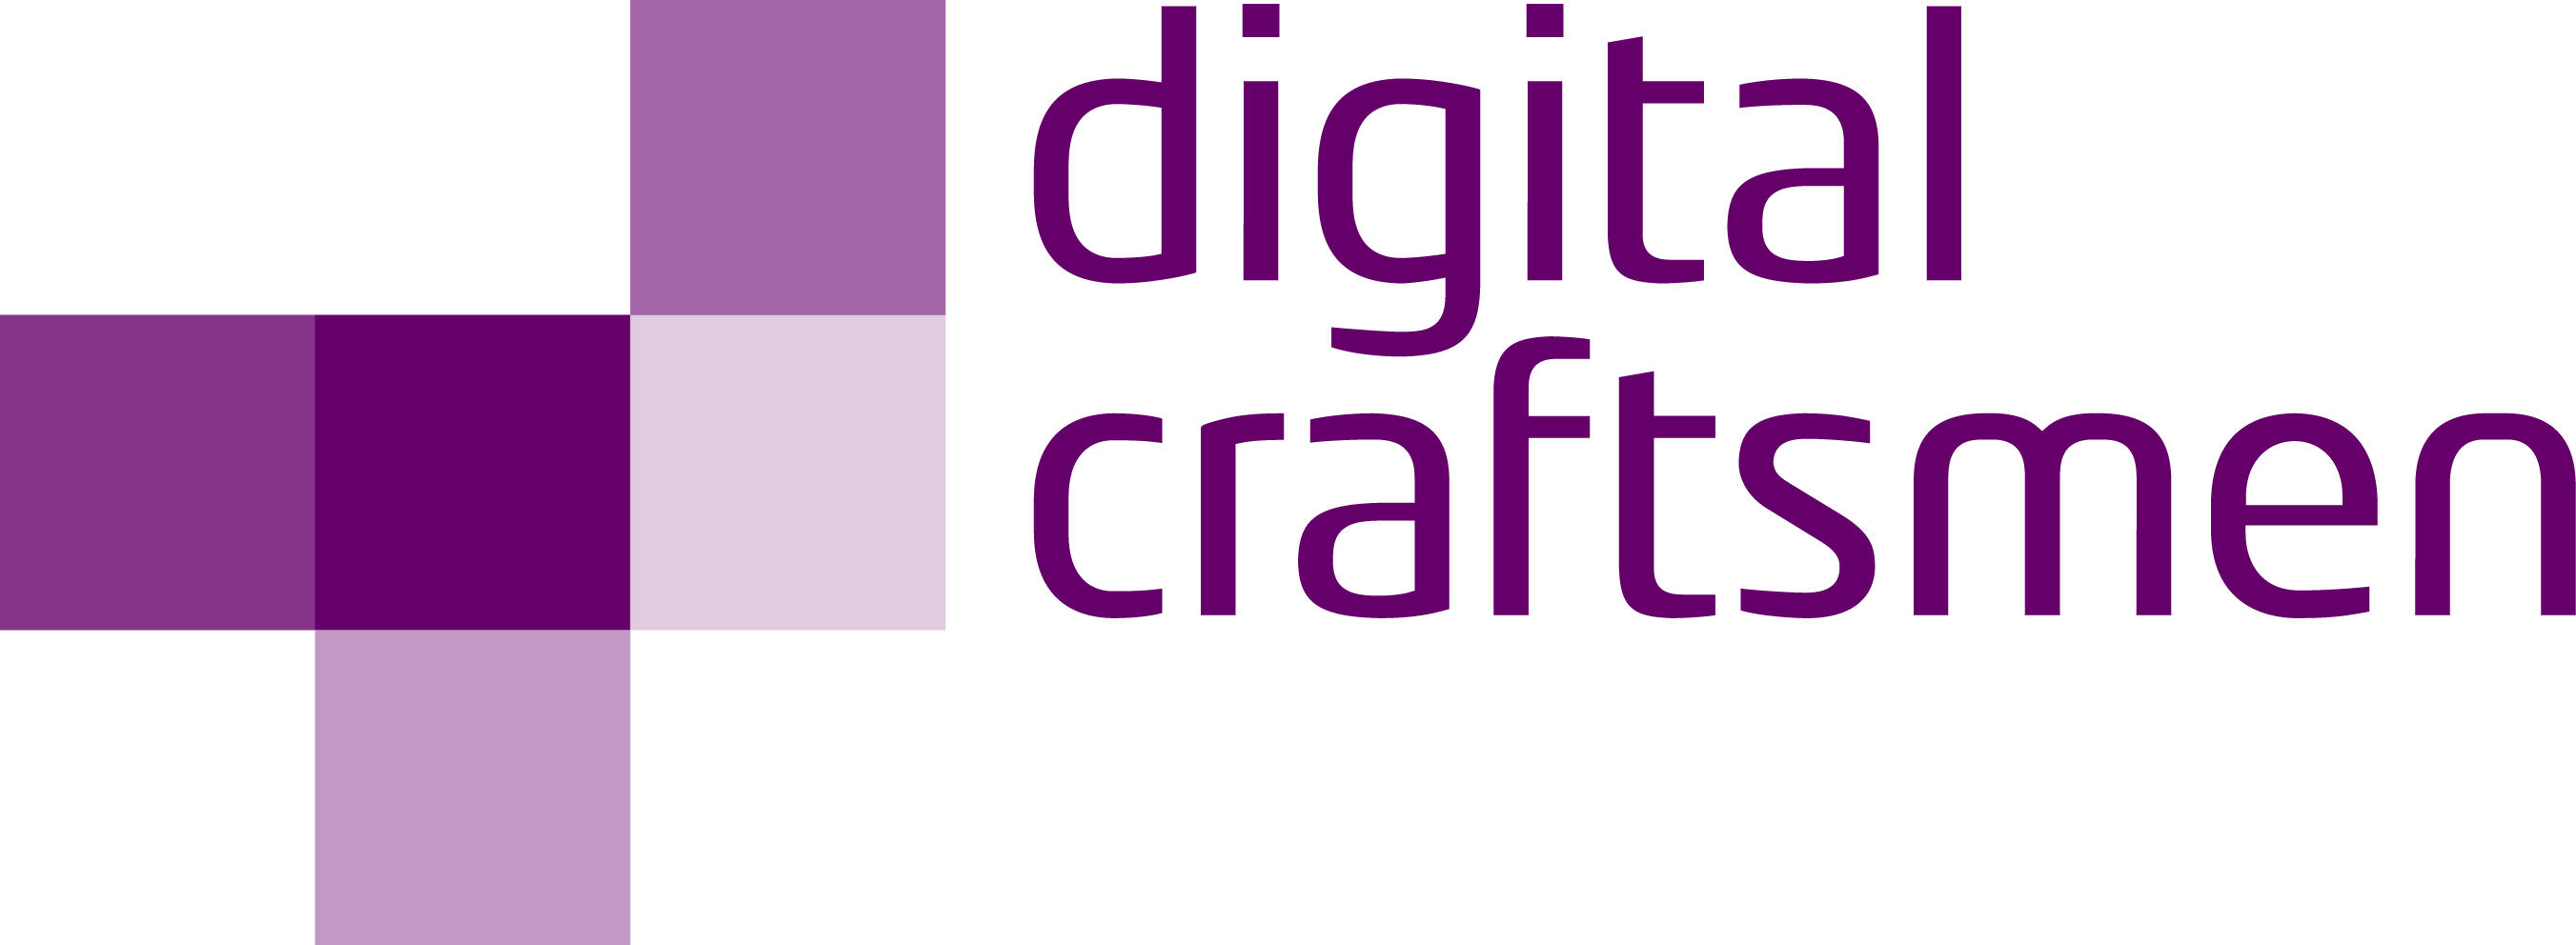 Digital Craftsmen Logo